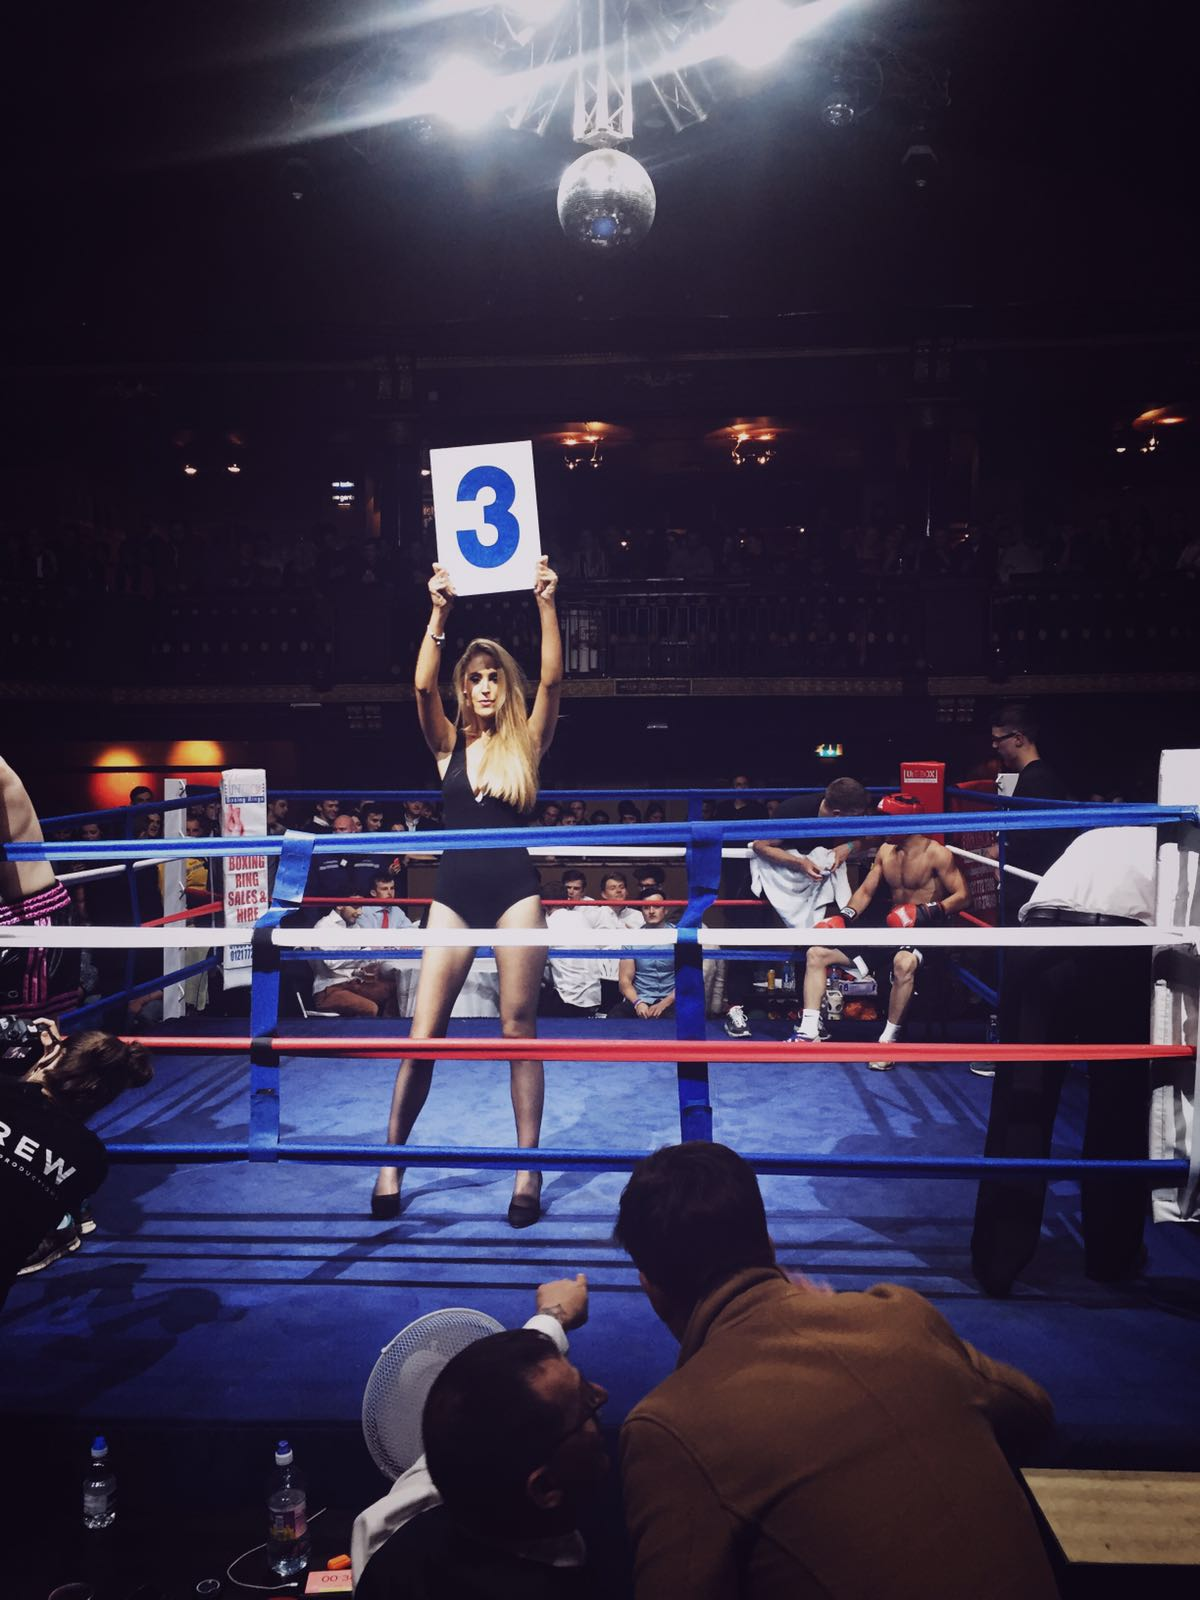 Ring Girl – Manchester Fight Night – 02 Ritz – 26th April 2016